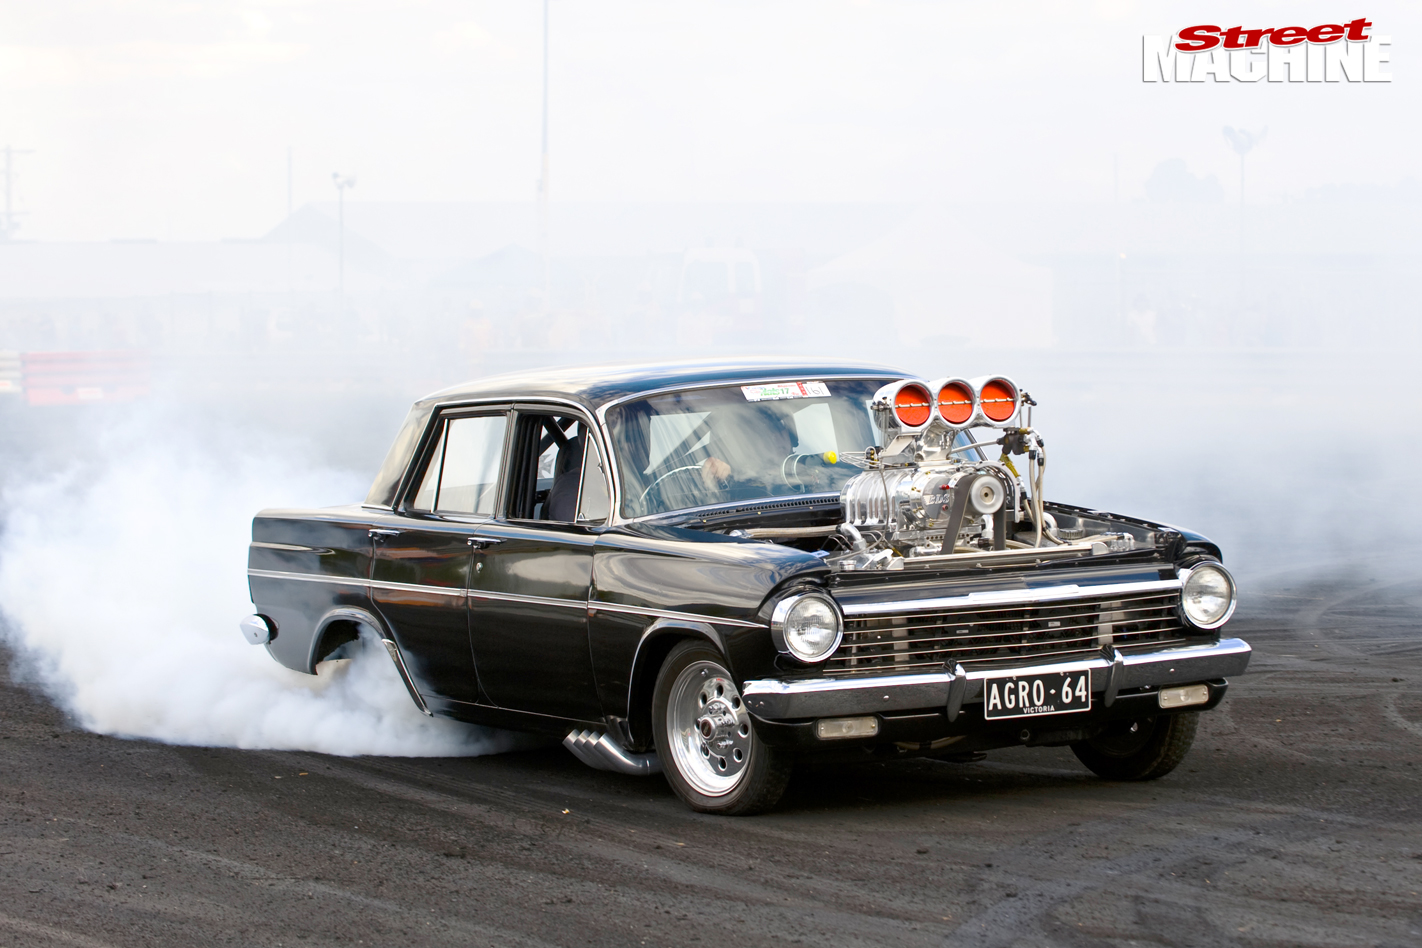 Holden -eh -agro 64-burnout